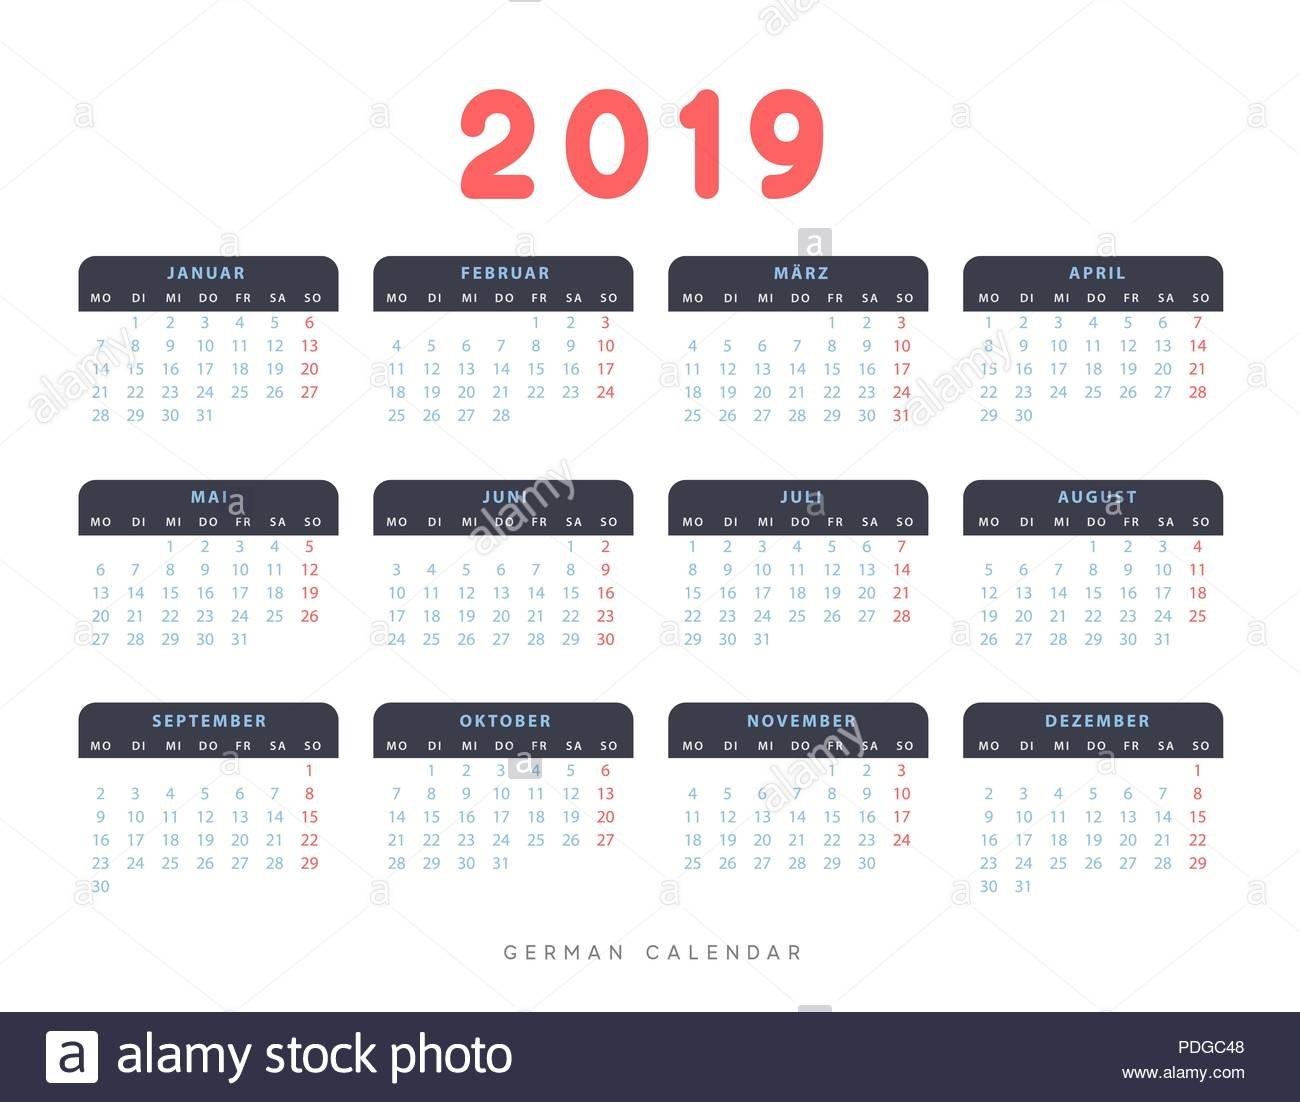 Simple Germany Calendar For 2019 Years, Week Starts On Monday Stock Calendar 2019 Germany Week Numbers